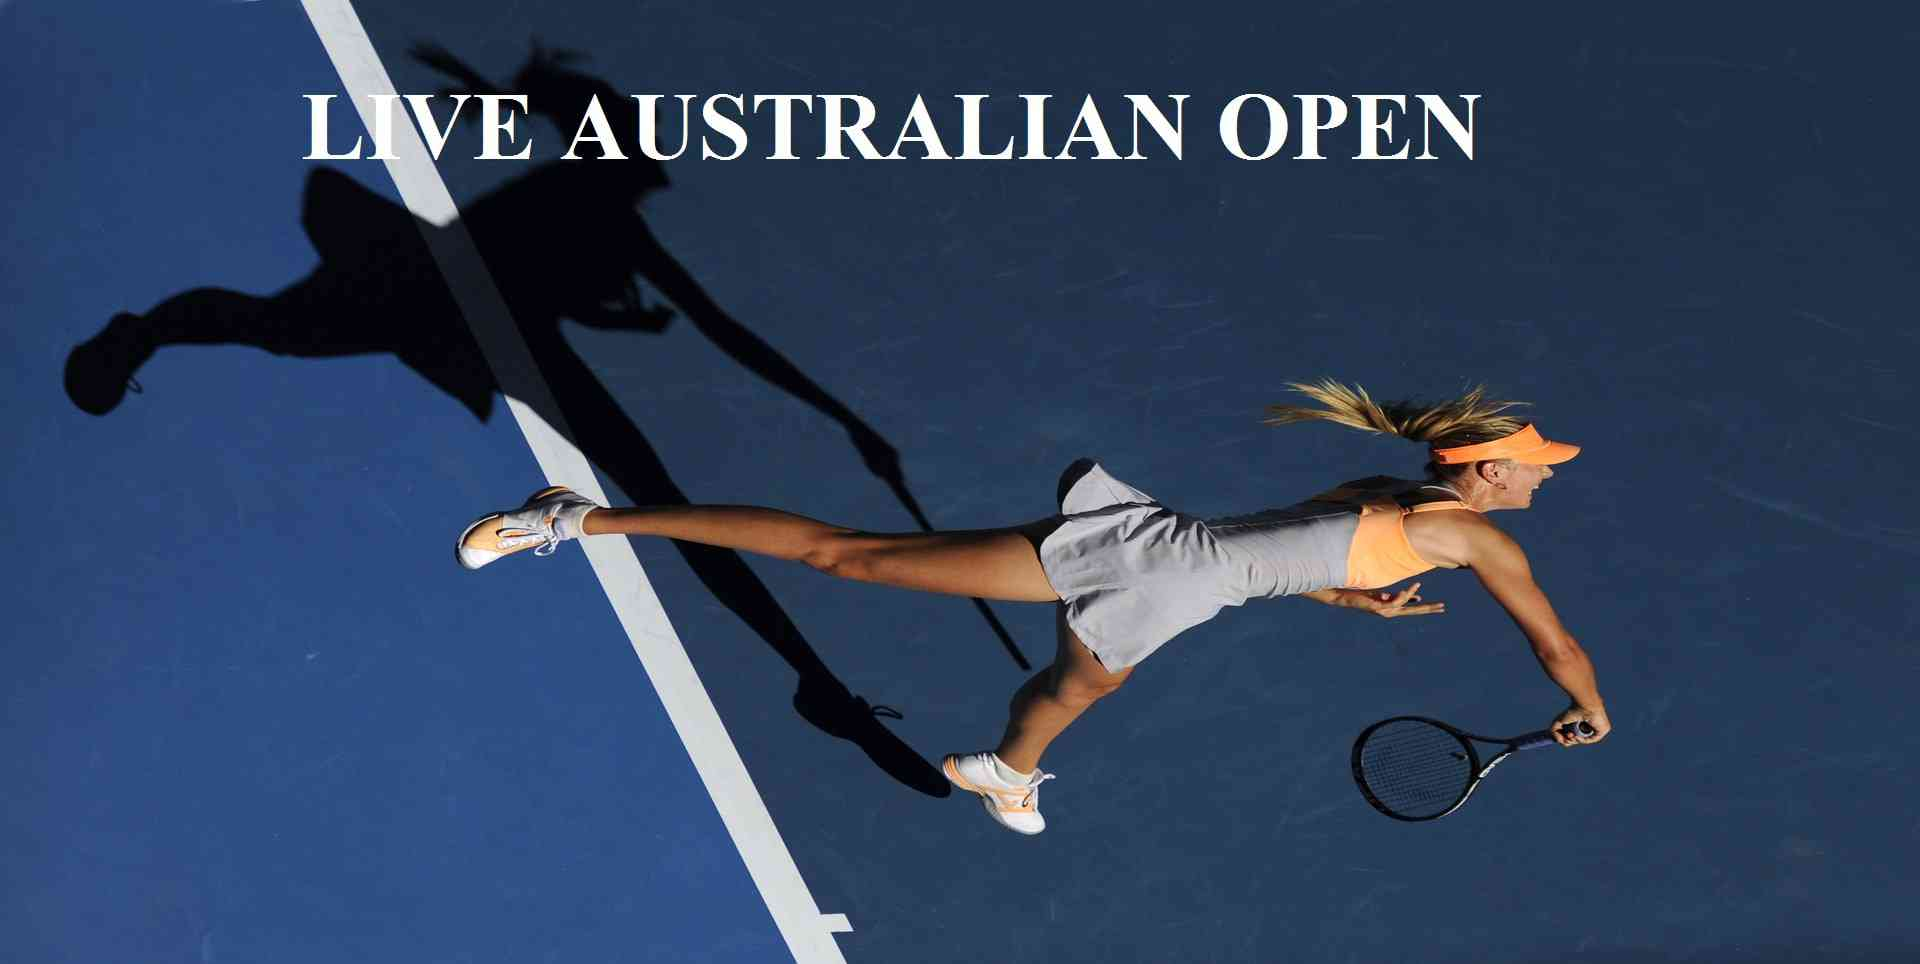 Belinda Bencic vs Serena Williams 1st Round Live Stream